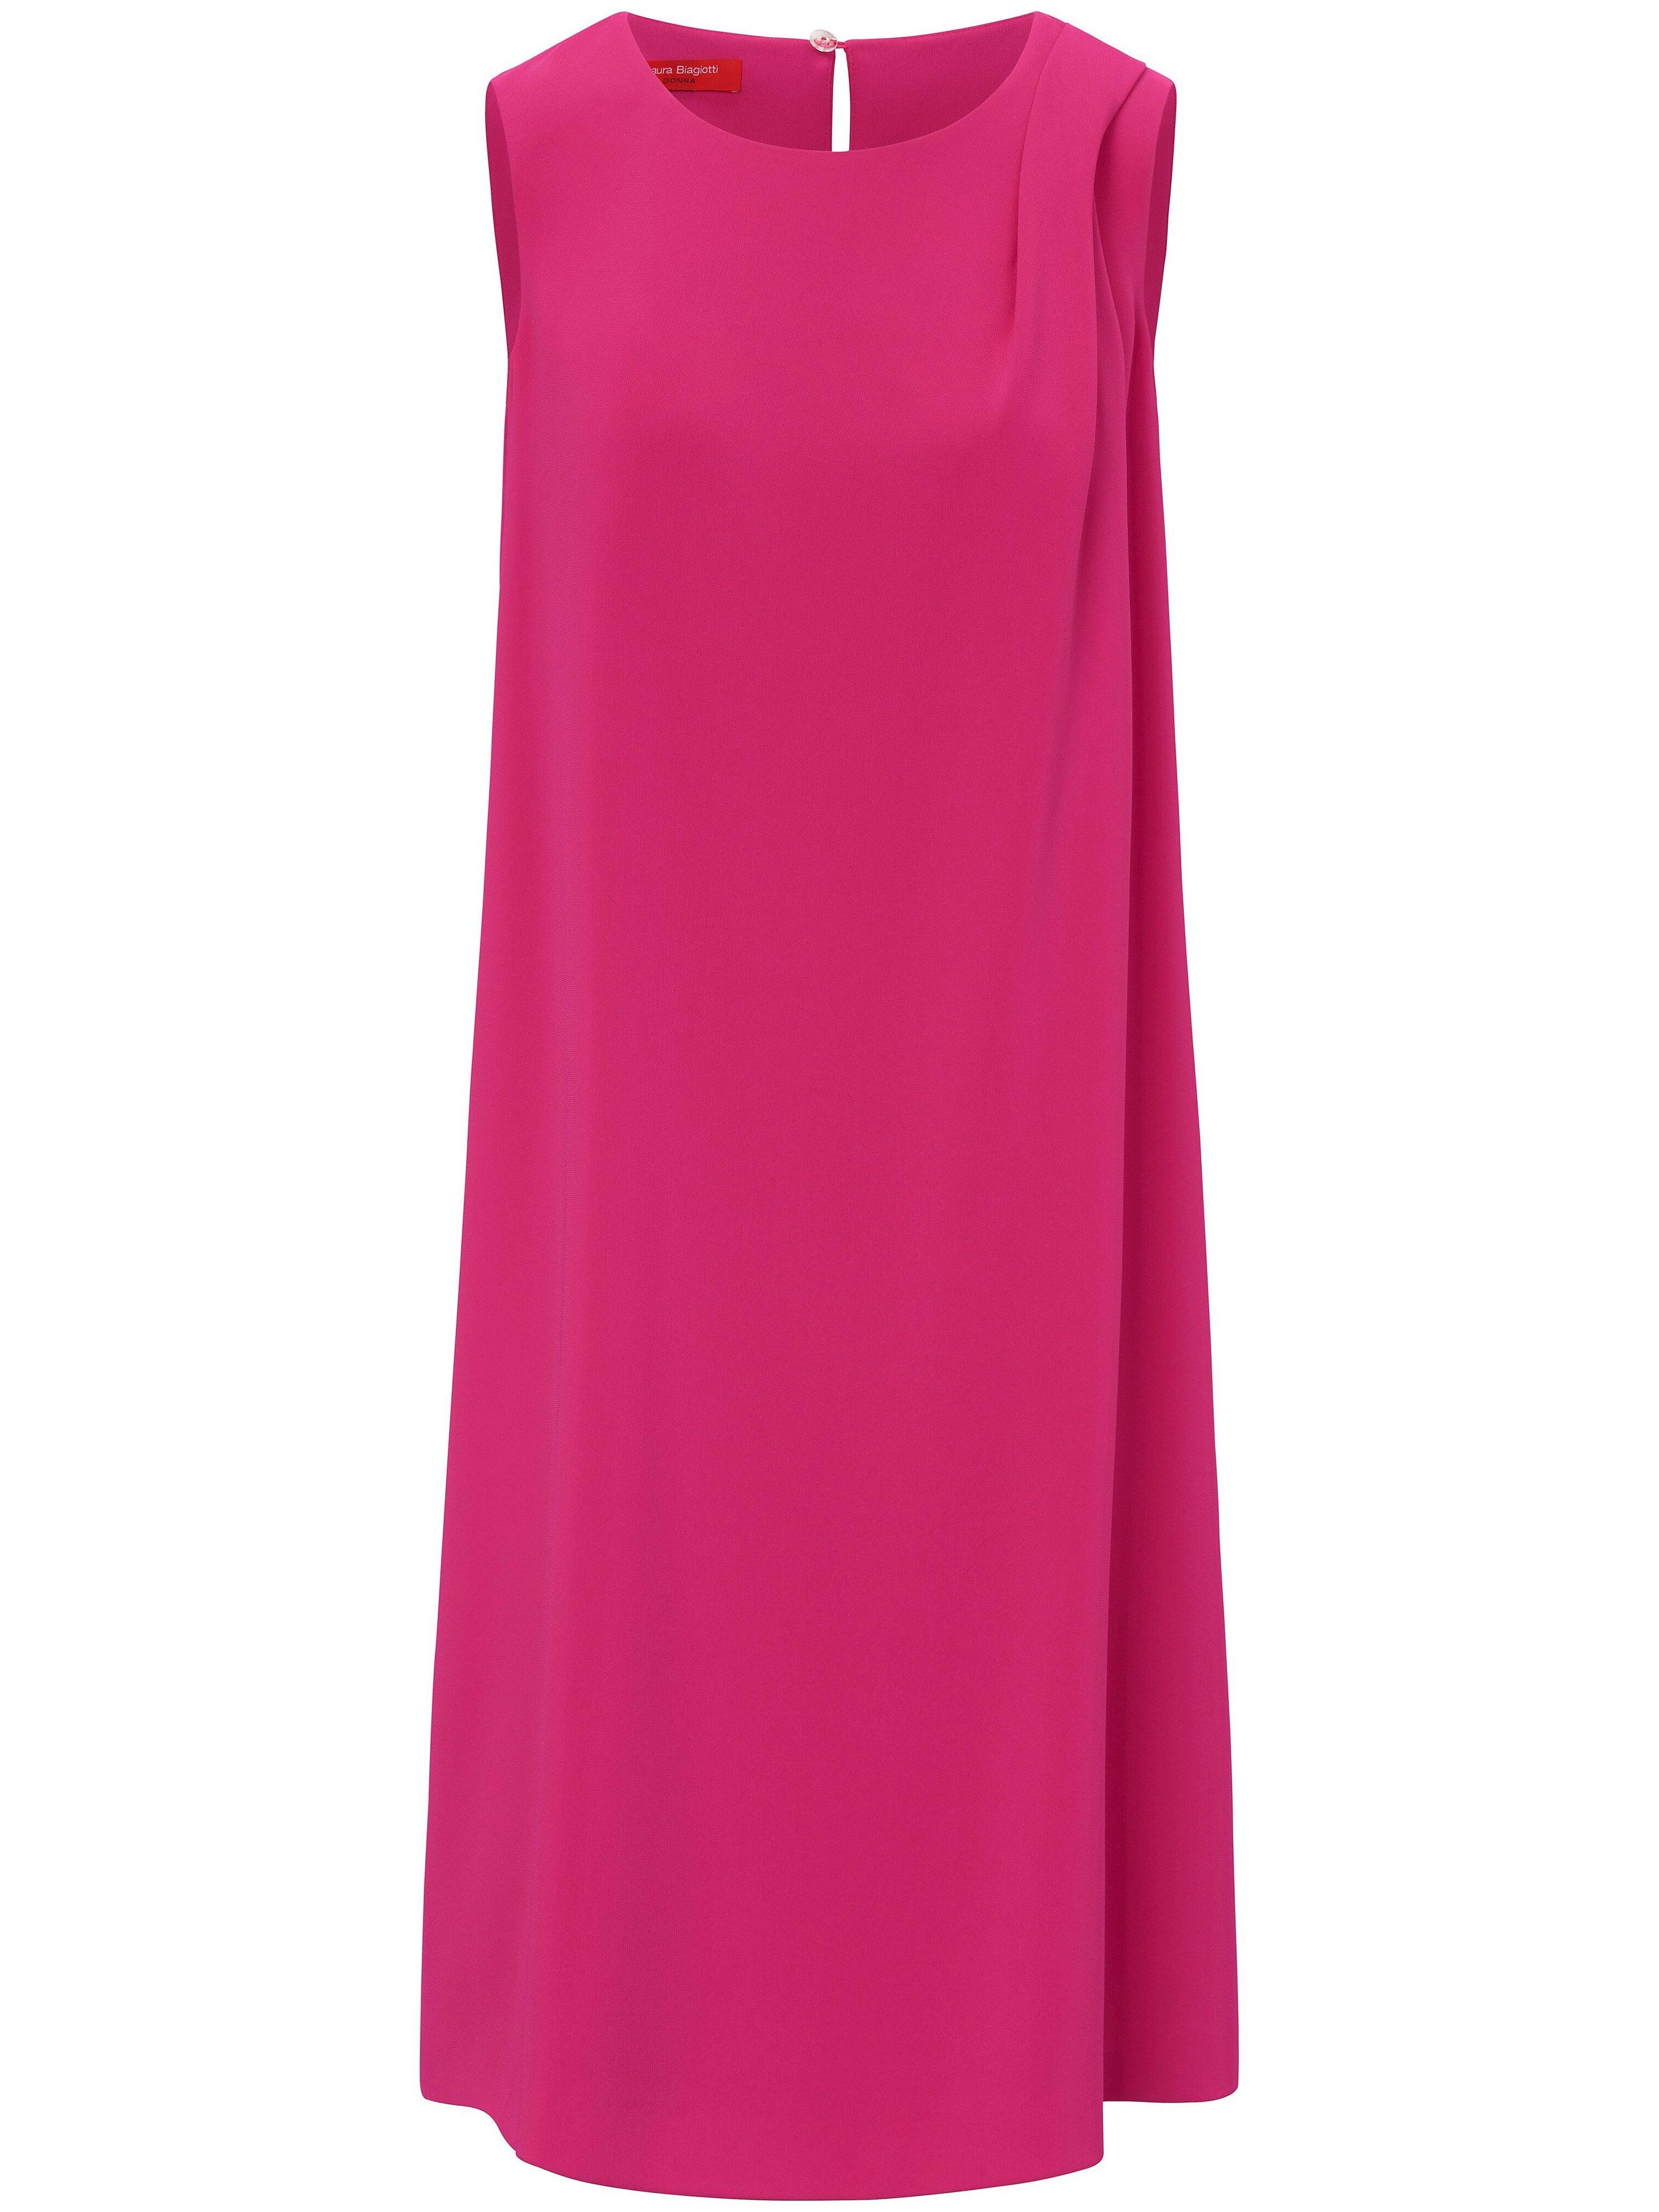 Mouwloze jurk Van Laura Biagiotti Donna roze